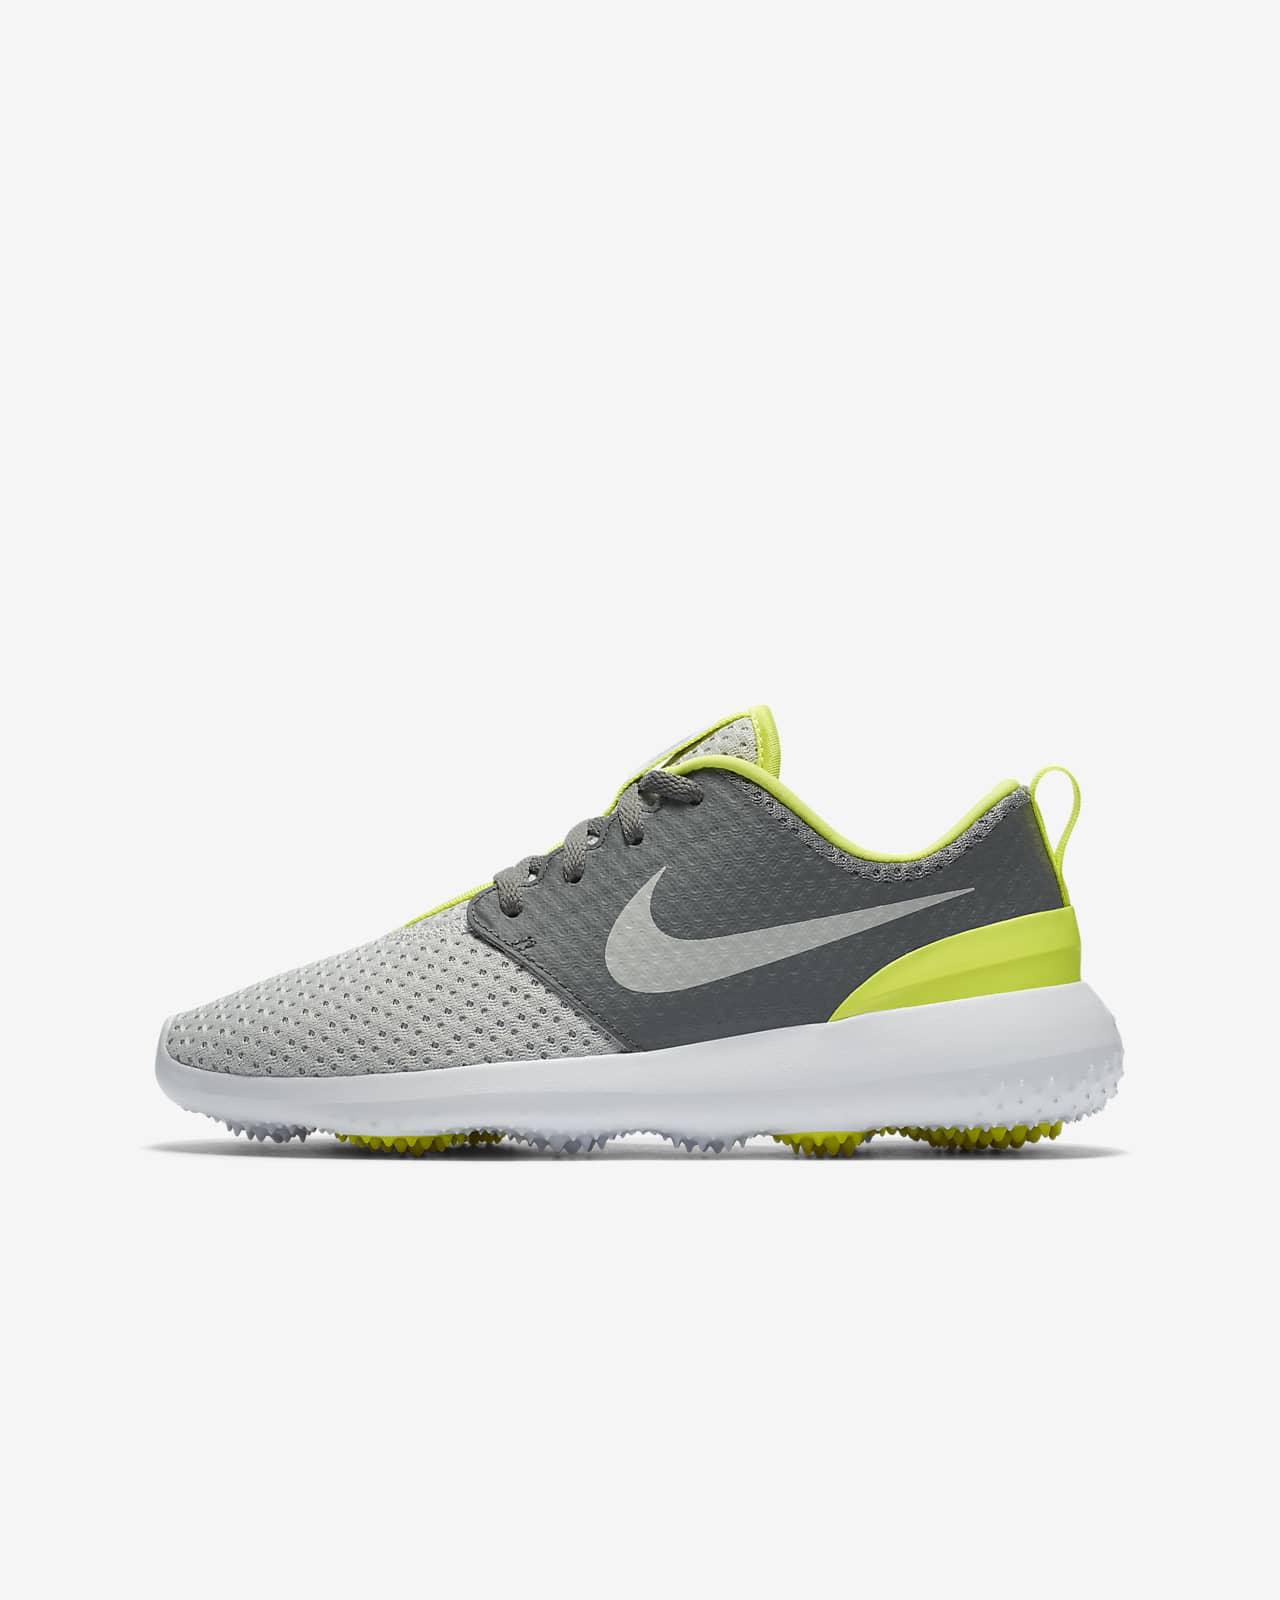 Nike Roshe G Jr. Golfschoen voor kids